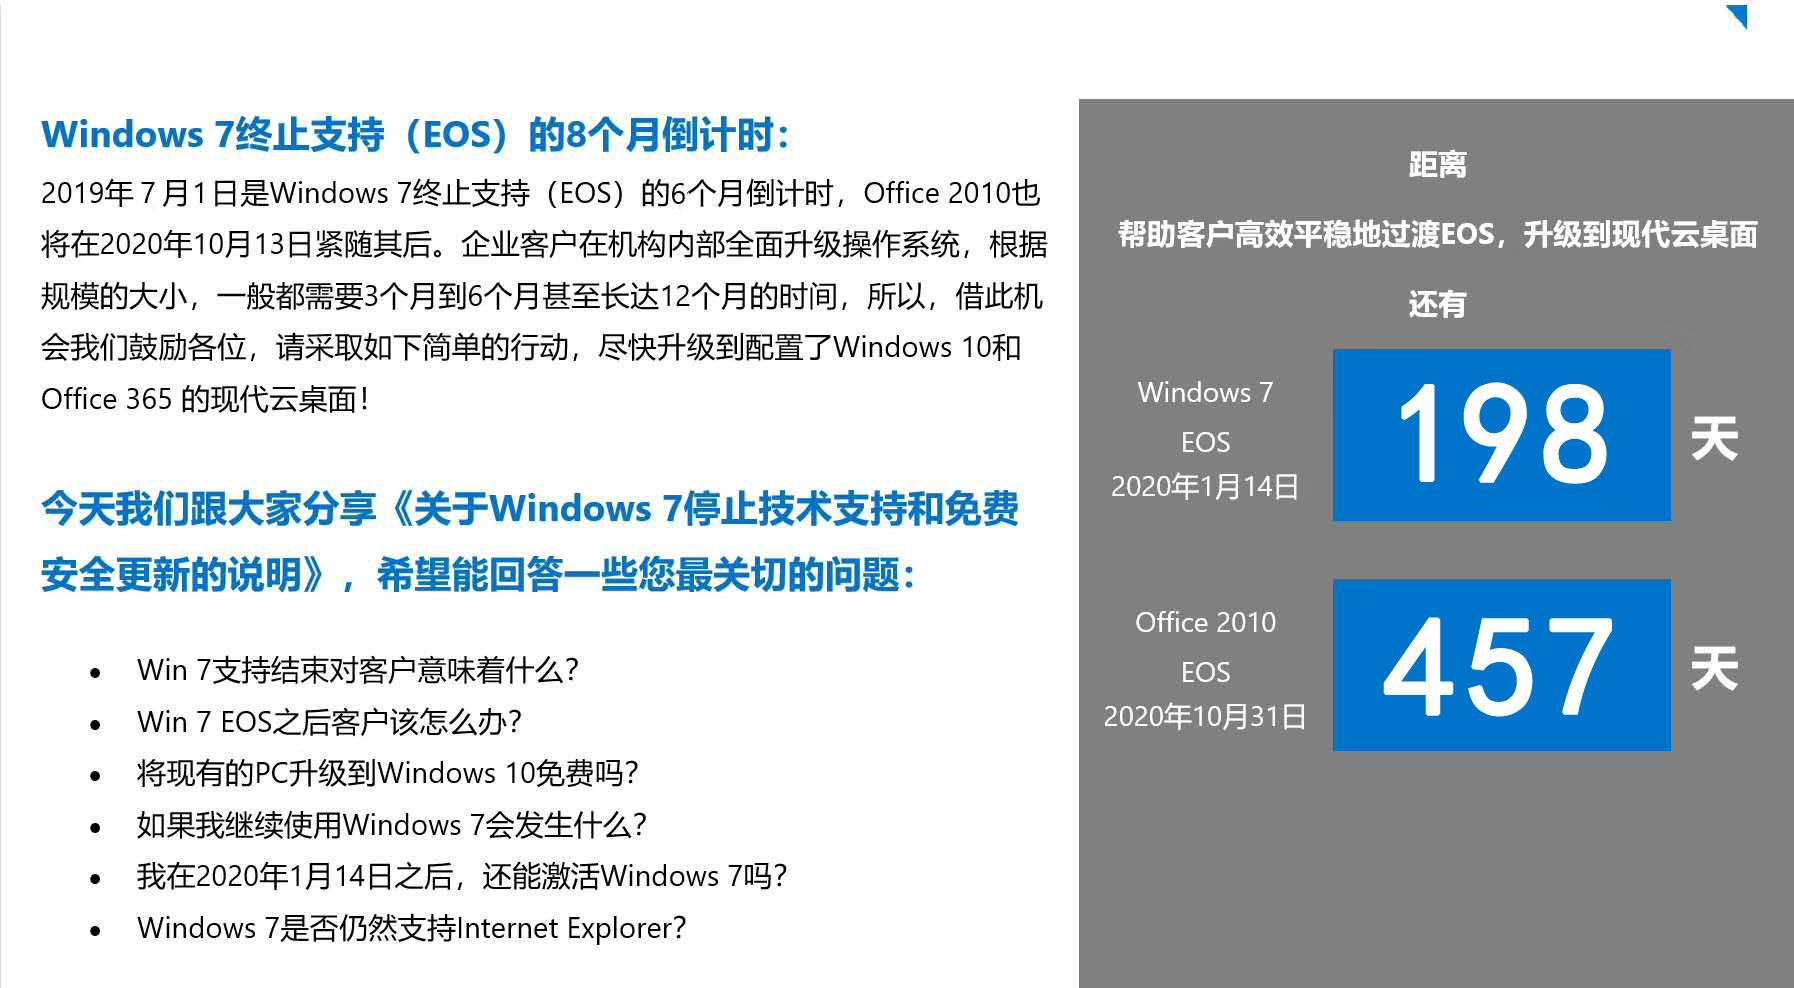 Windows7 的支持已近尾声